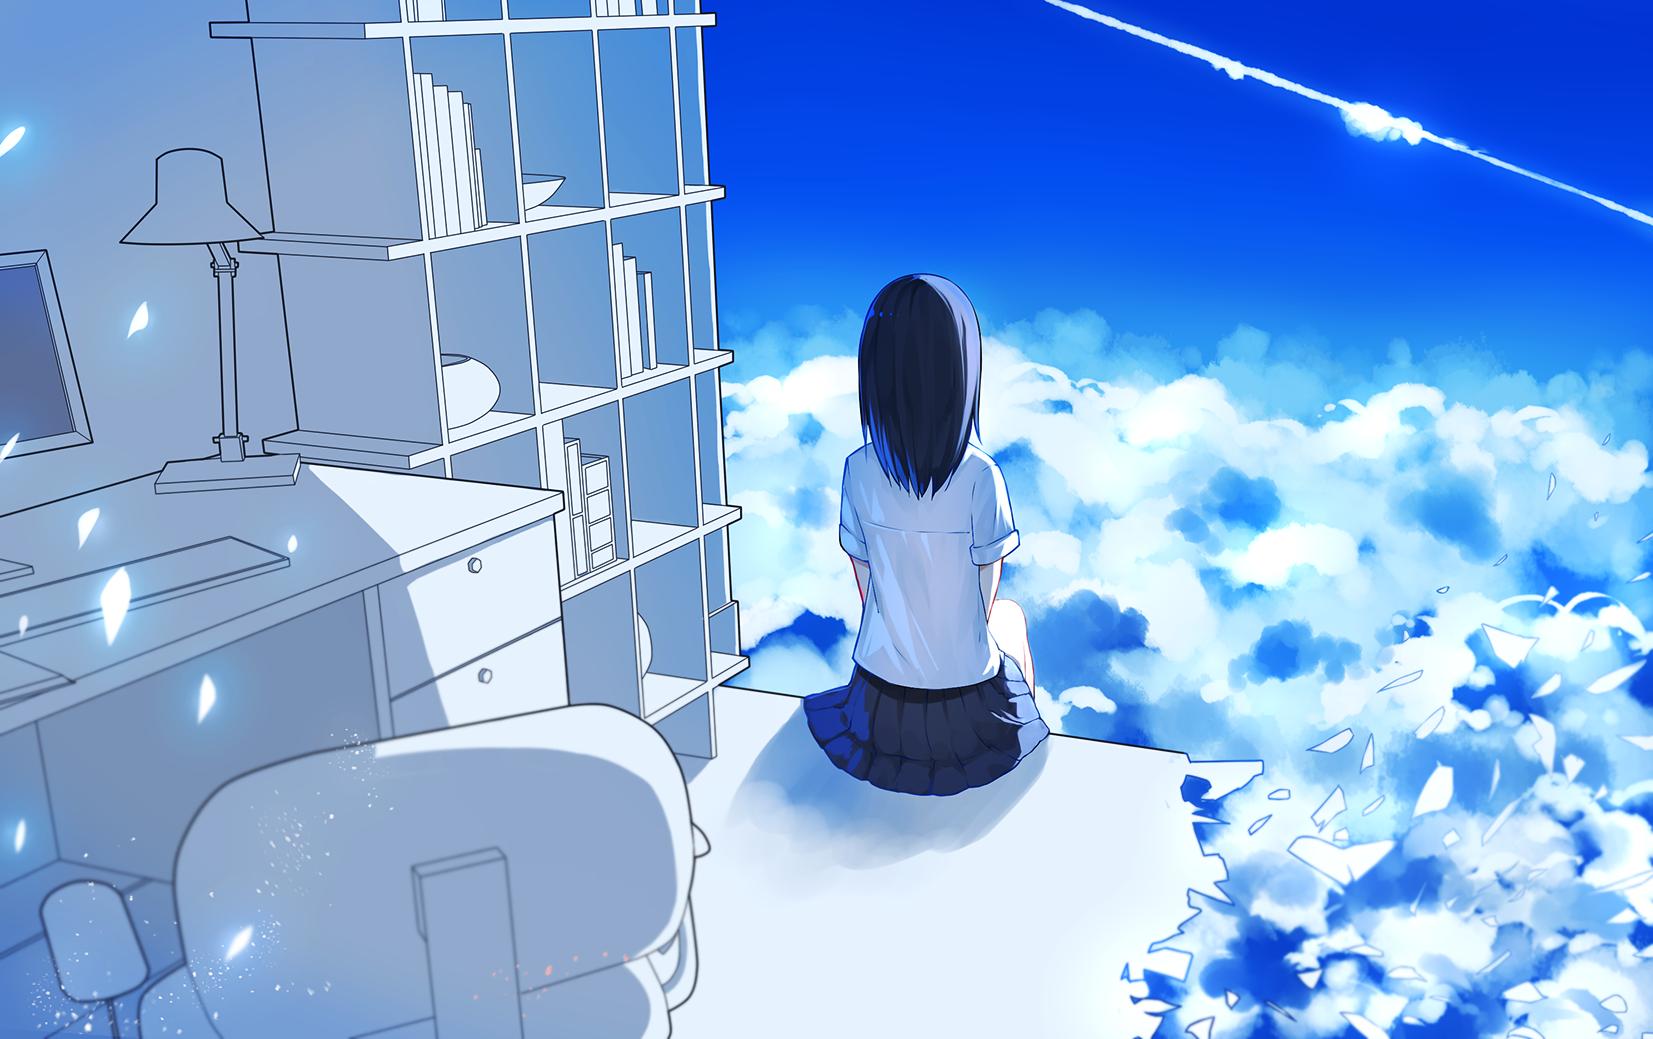 Pin od pouvatea jenelle ellison na nstenke anime pinterest anime scenria umenie fantasy fantastick krajiny manga slena kreslen anime dievat smutn anime lt prrodn scenrie pozadia voltagebd Choice Image